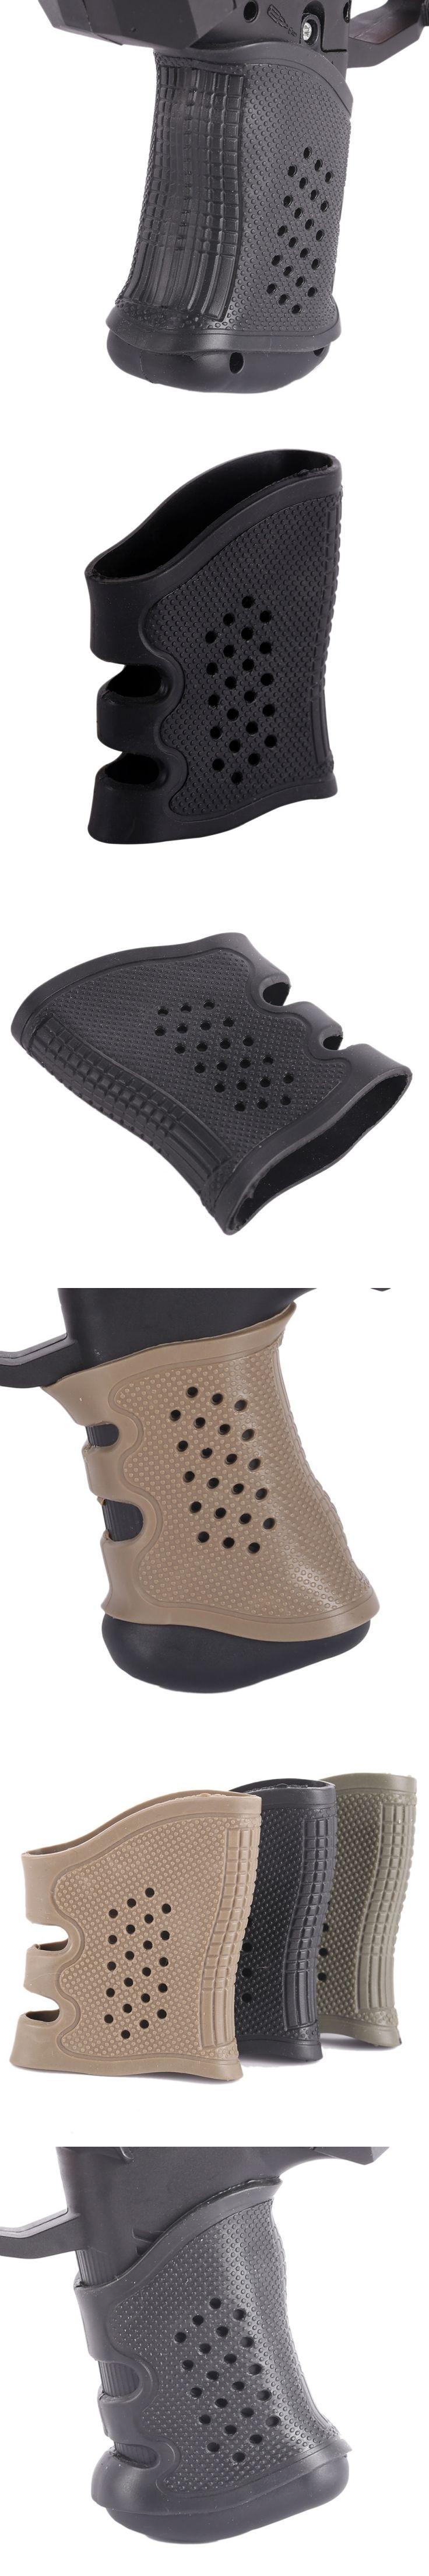 Tactical Gun Handle Rubber Handle Protective Case Tactical Holster Non-slip 3 colors